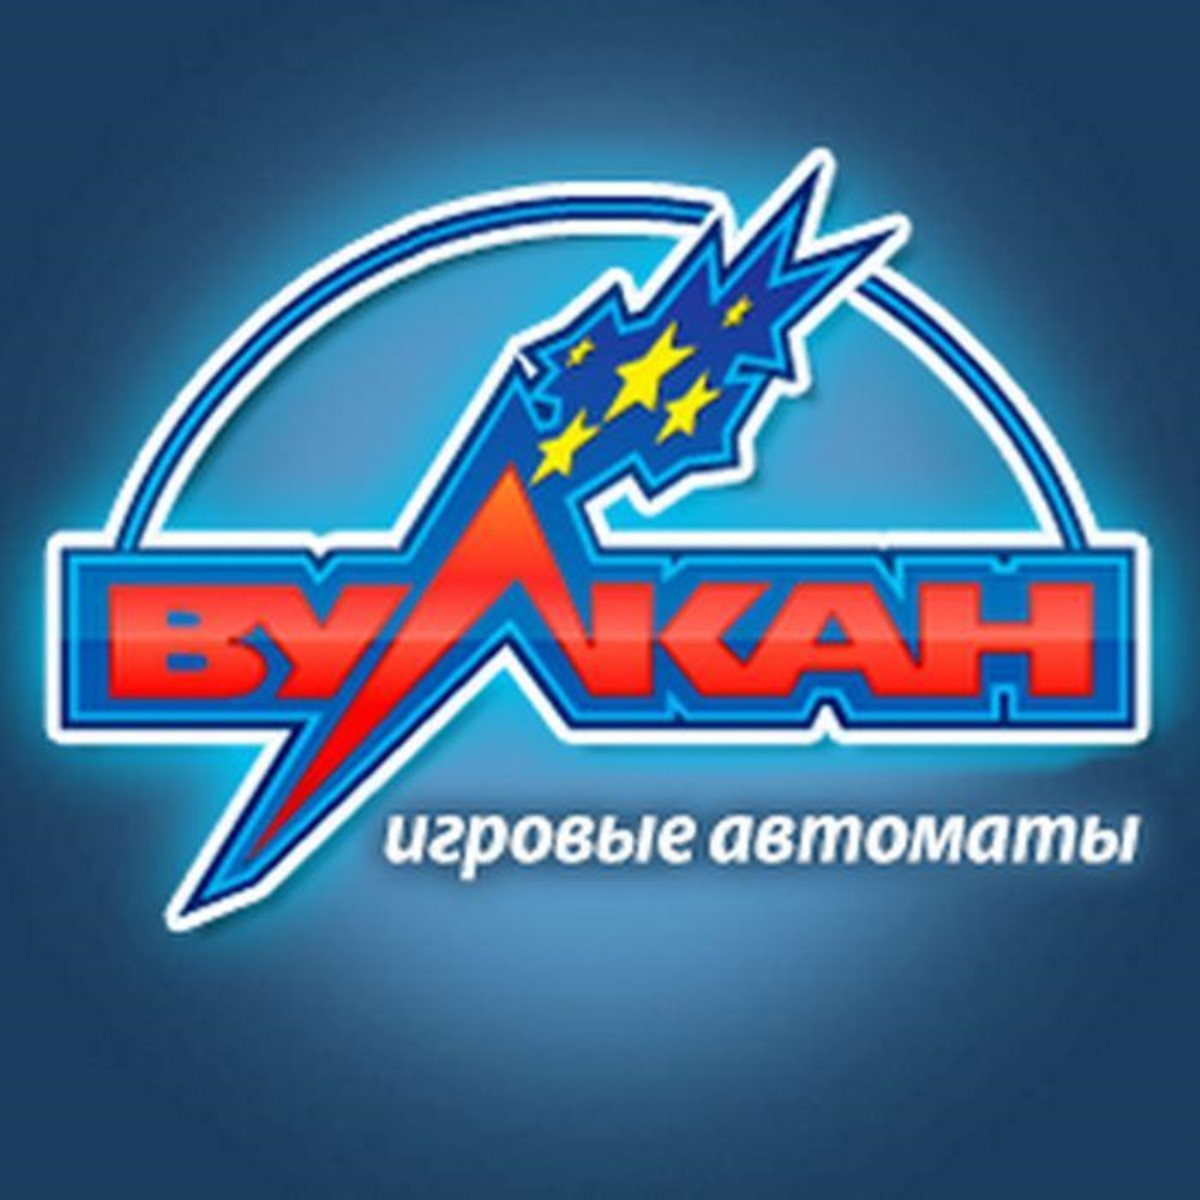 https://vesti-ua.net/uploads/posts/2016-01/1453805489_1418060529_09.jpg